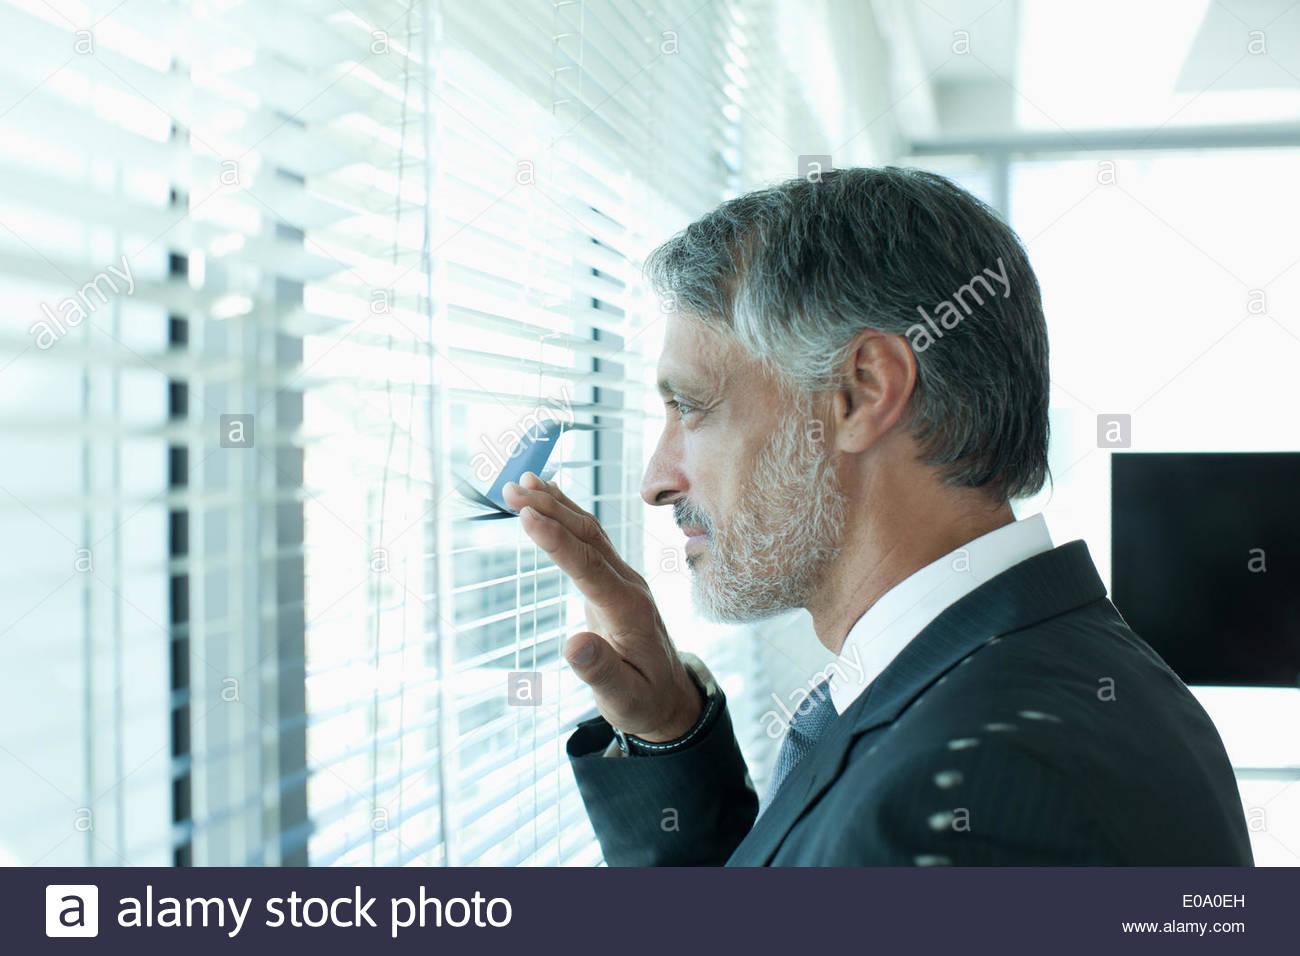 Portrait of businessman at window Photo Stock